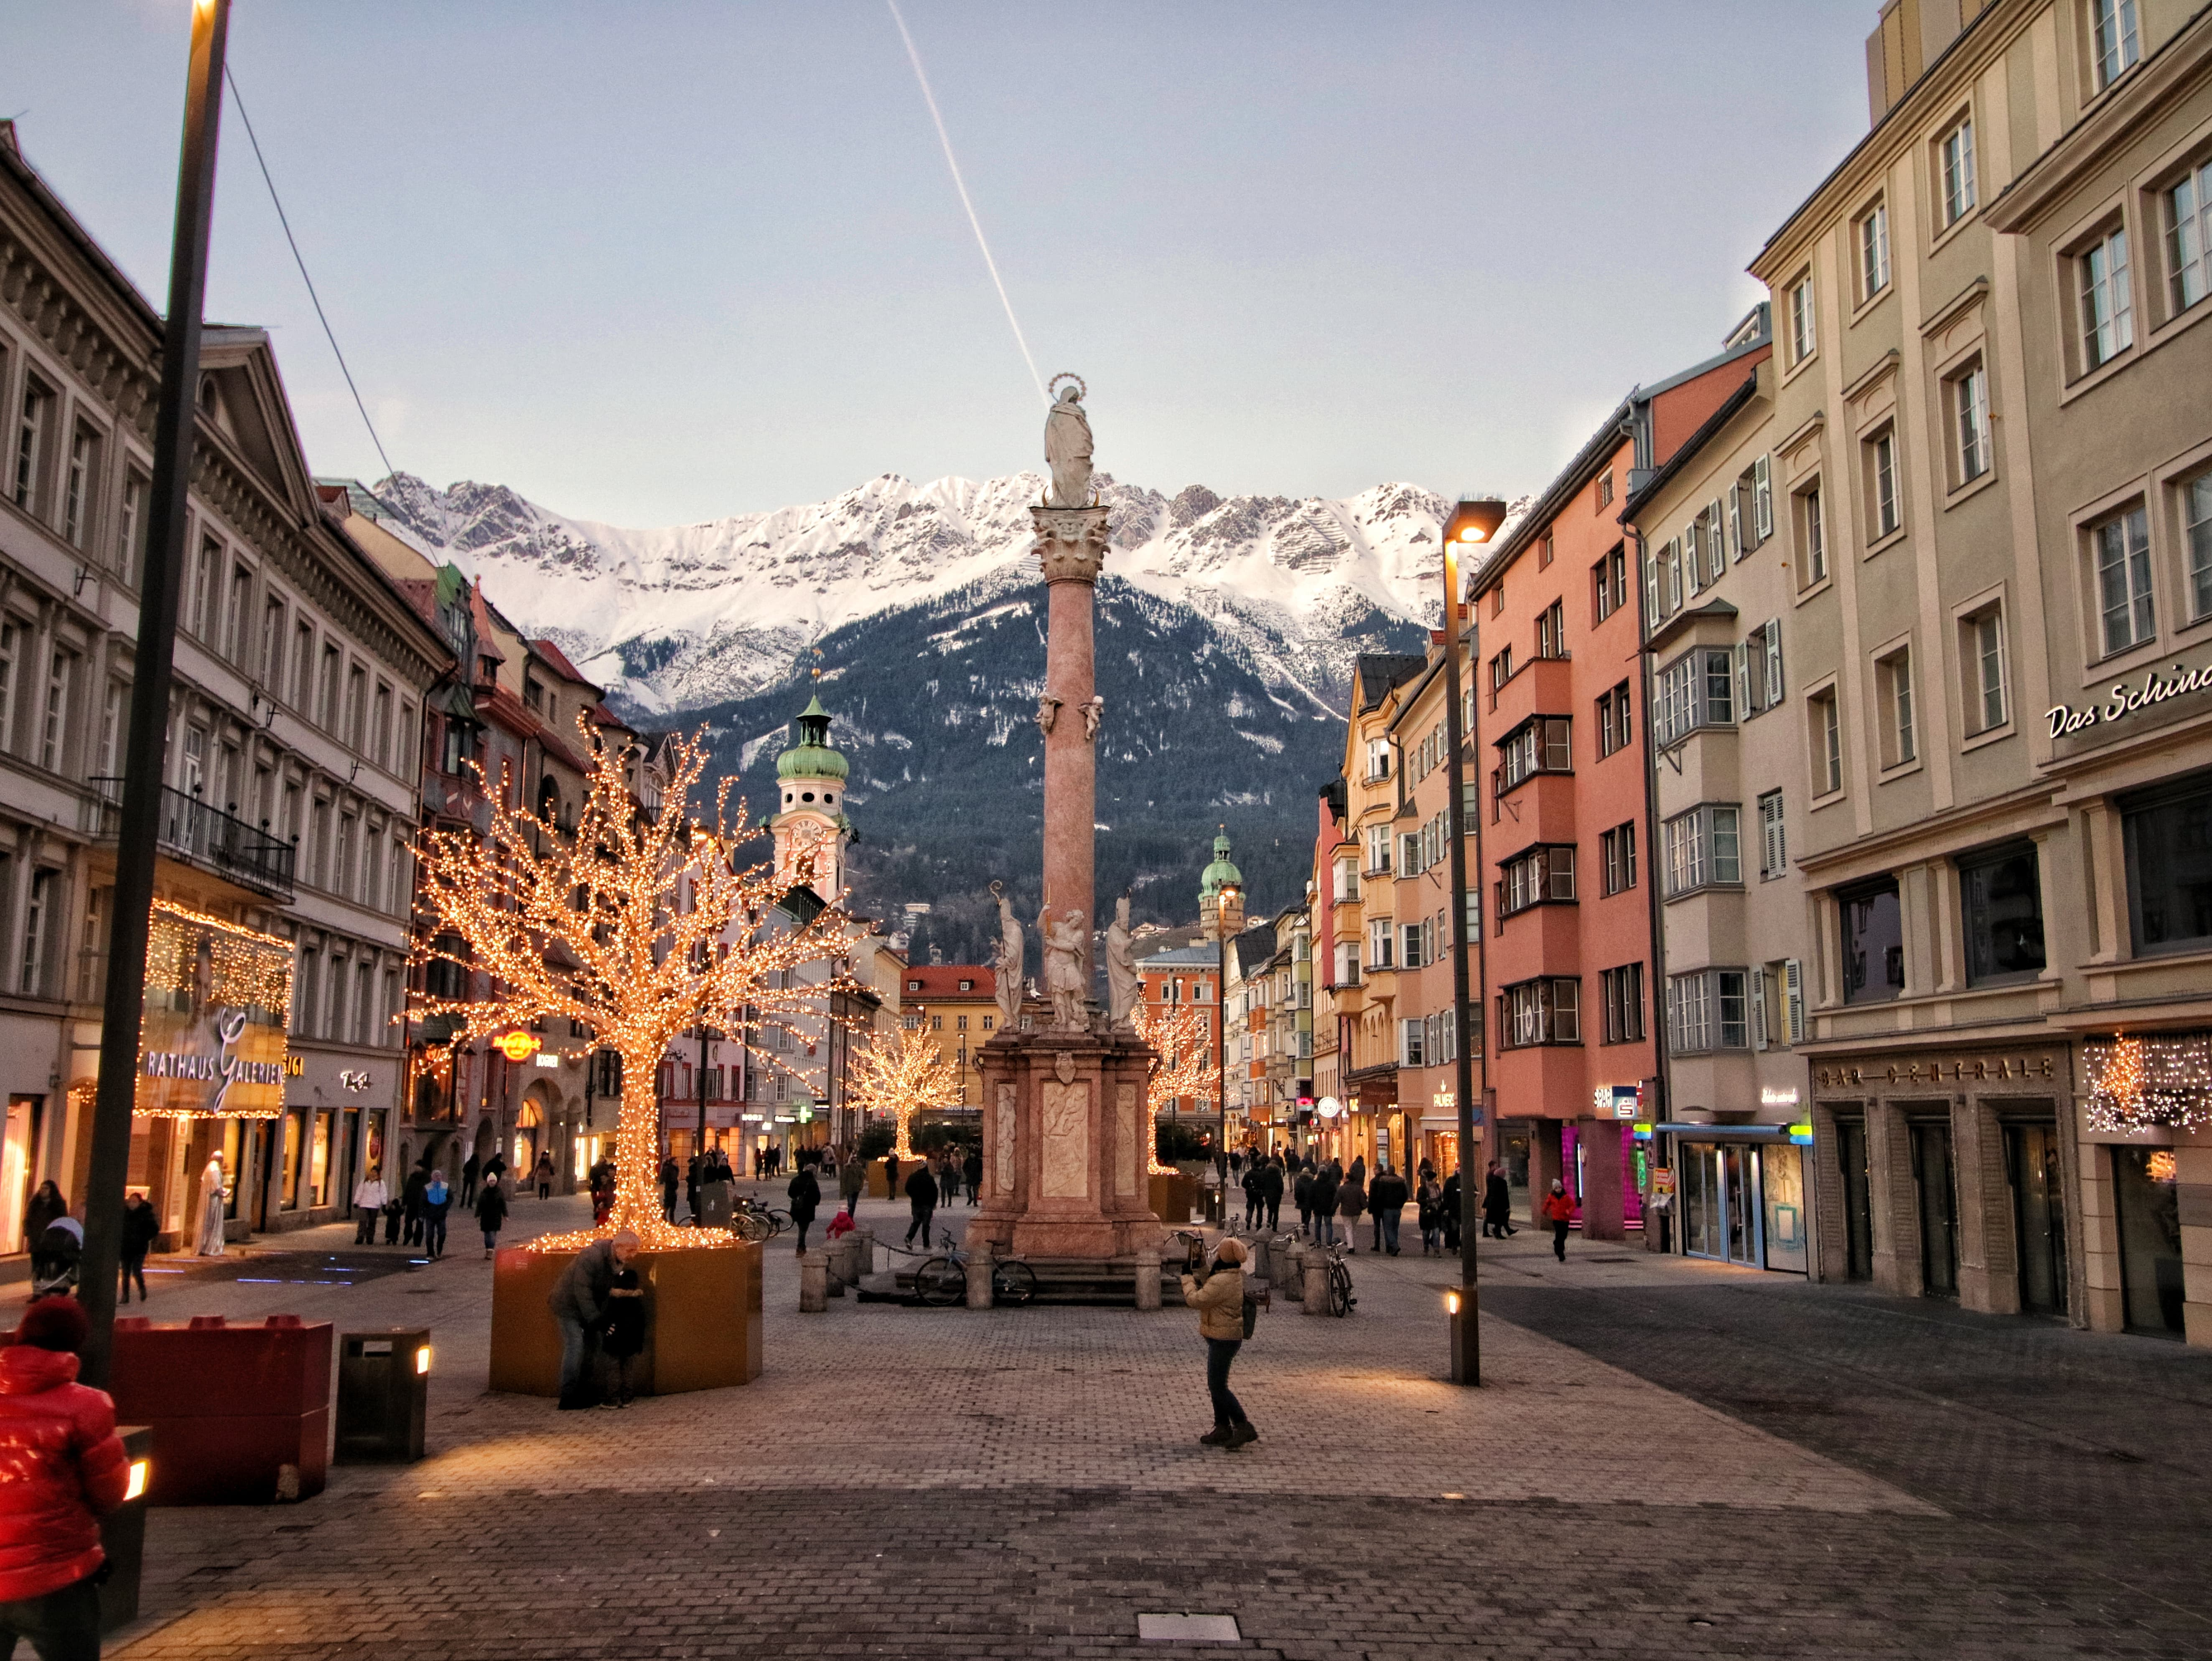 Visitare Innsbruck la prima volta: Maria-Theresien-Straße